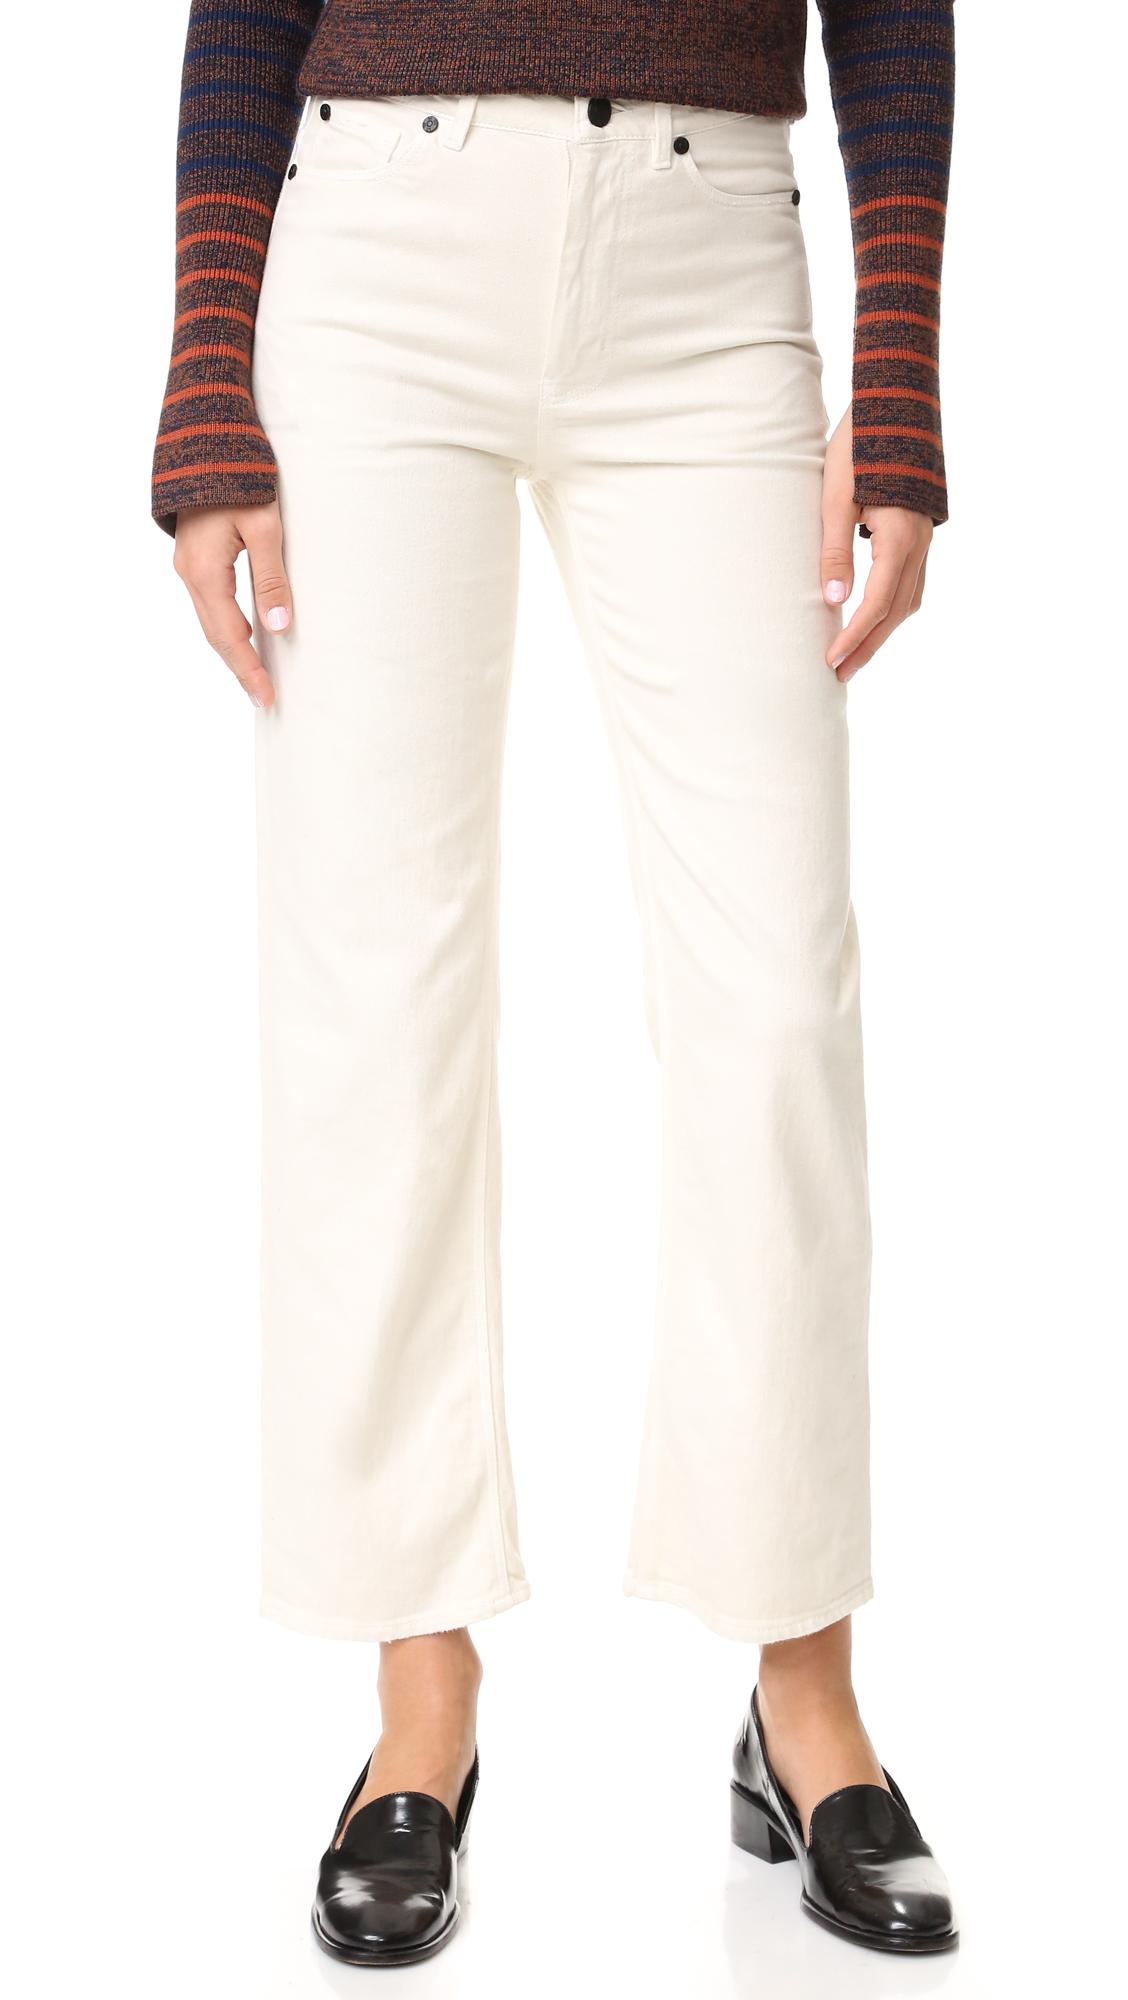 La Vie Rebecca Taylor Amelie Jeans - Ecru at Shopbop